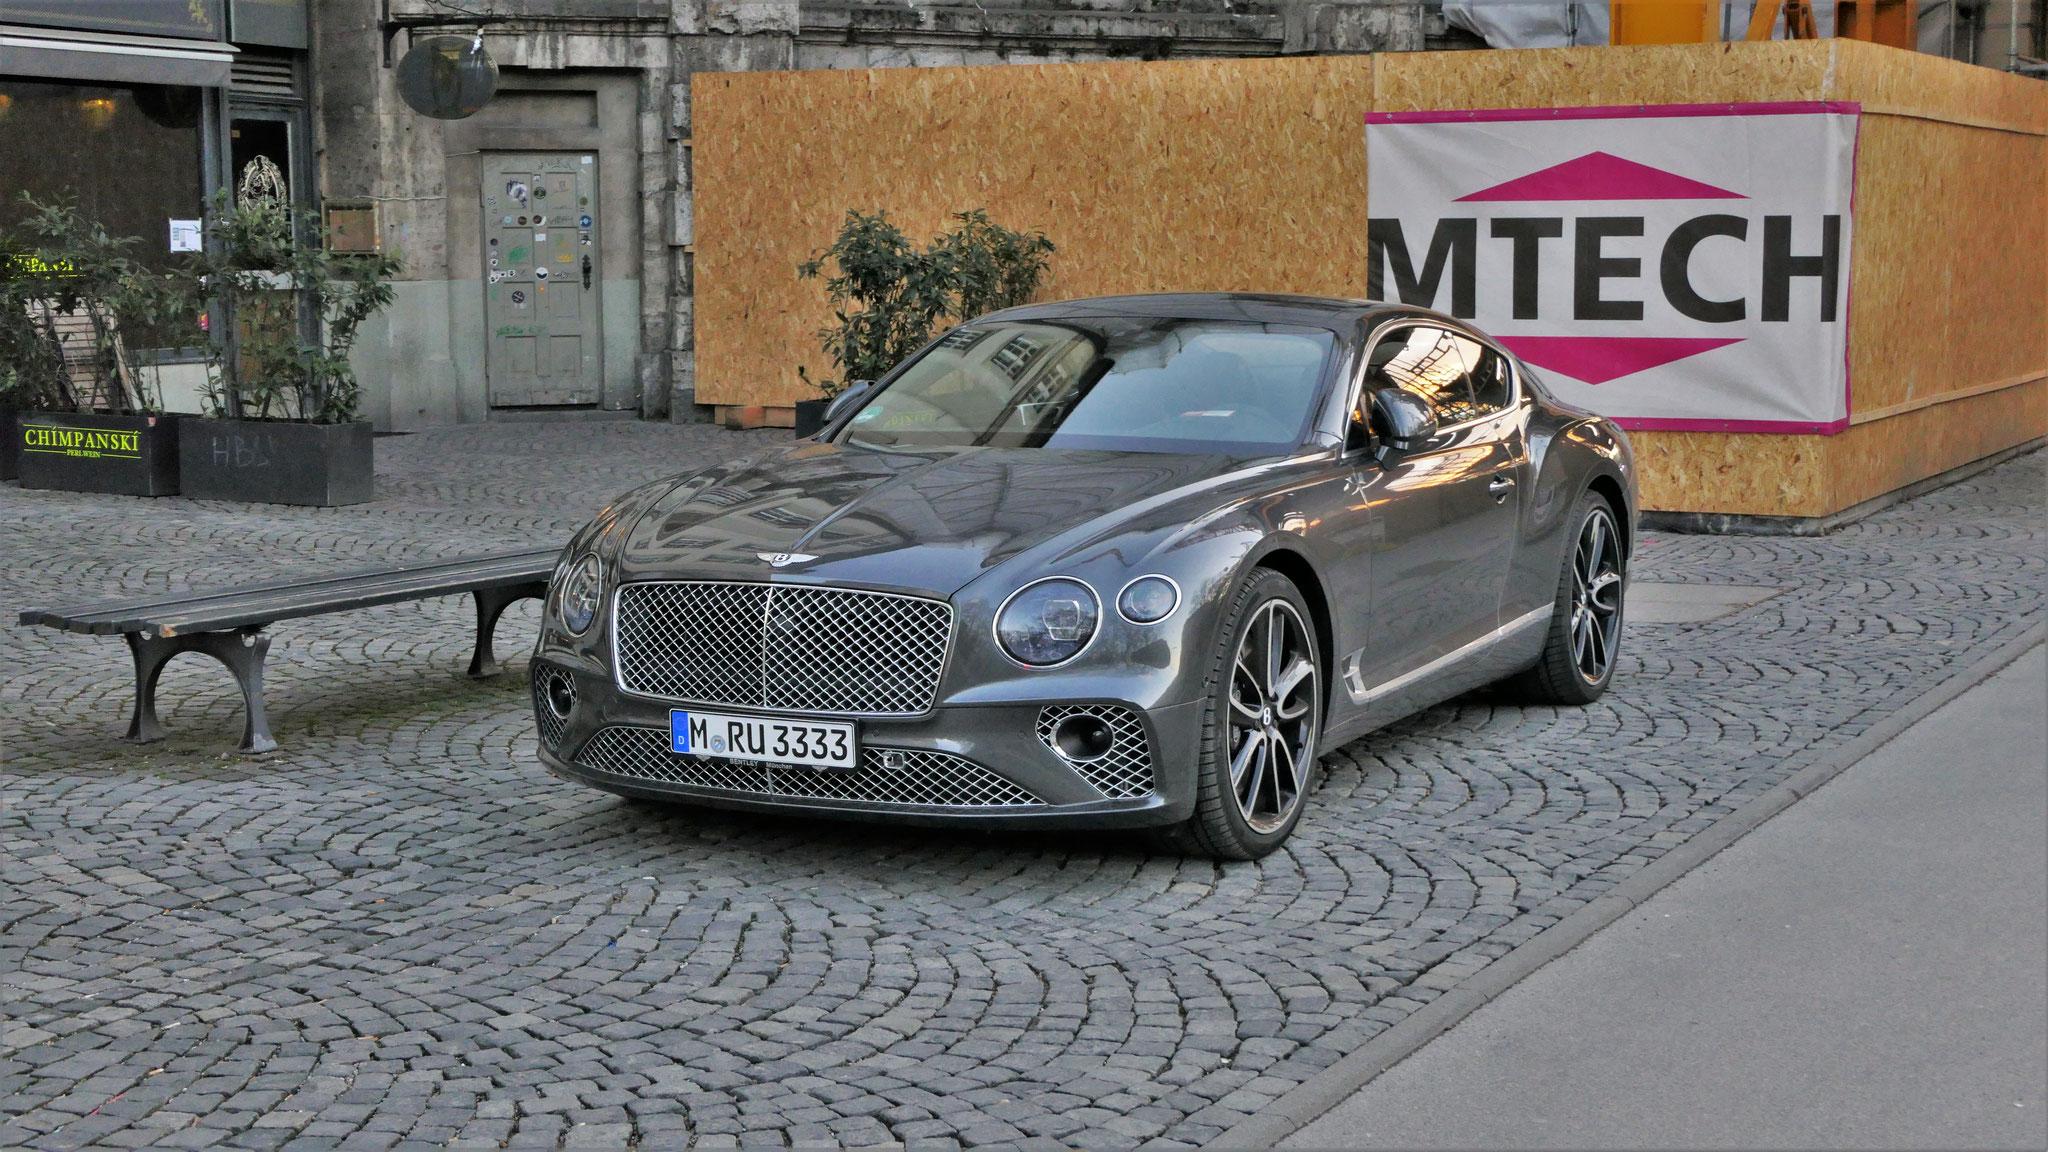 Bentley Continental GT - M-RU-3333